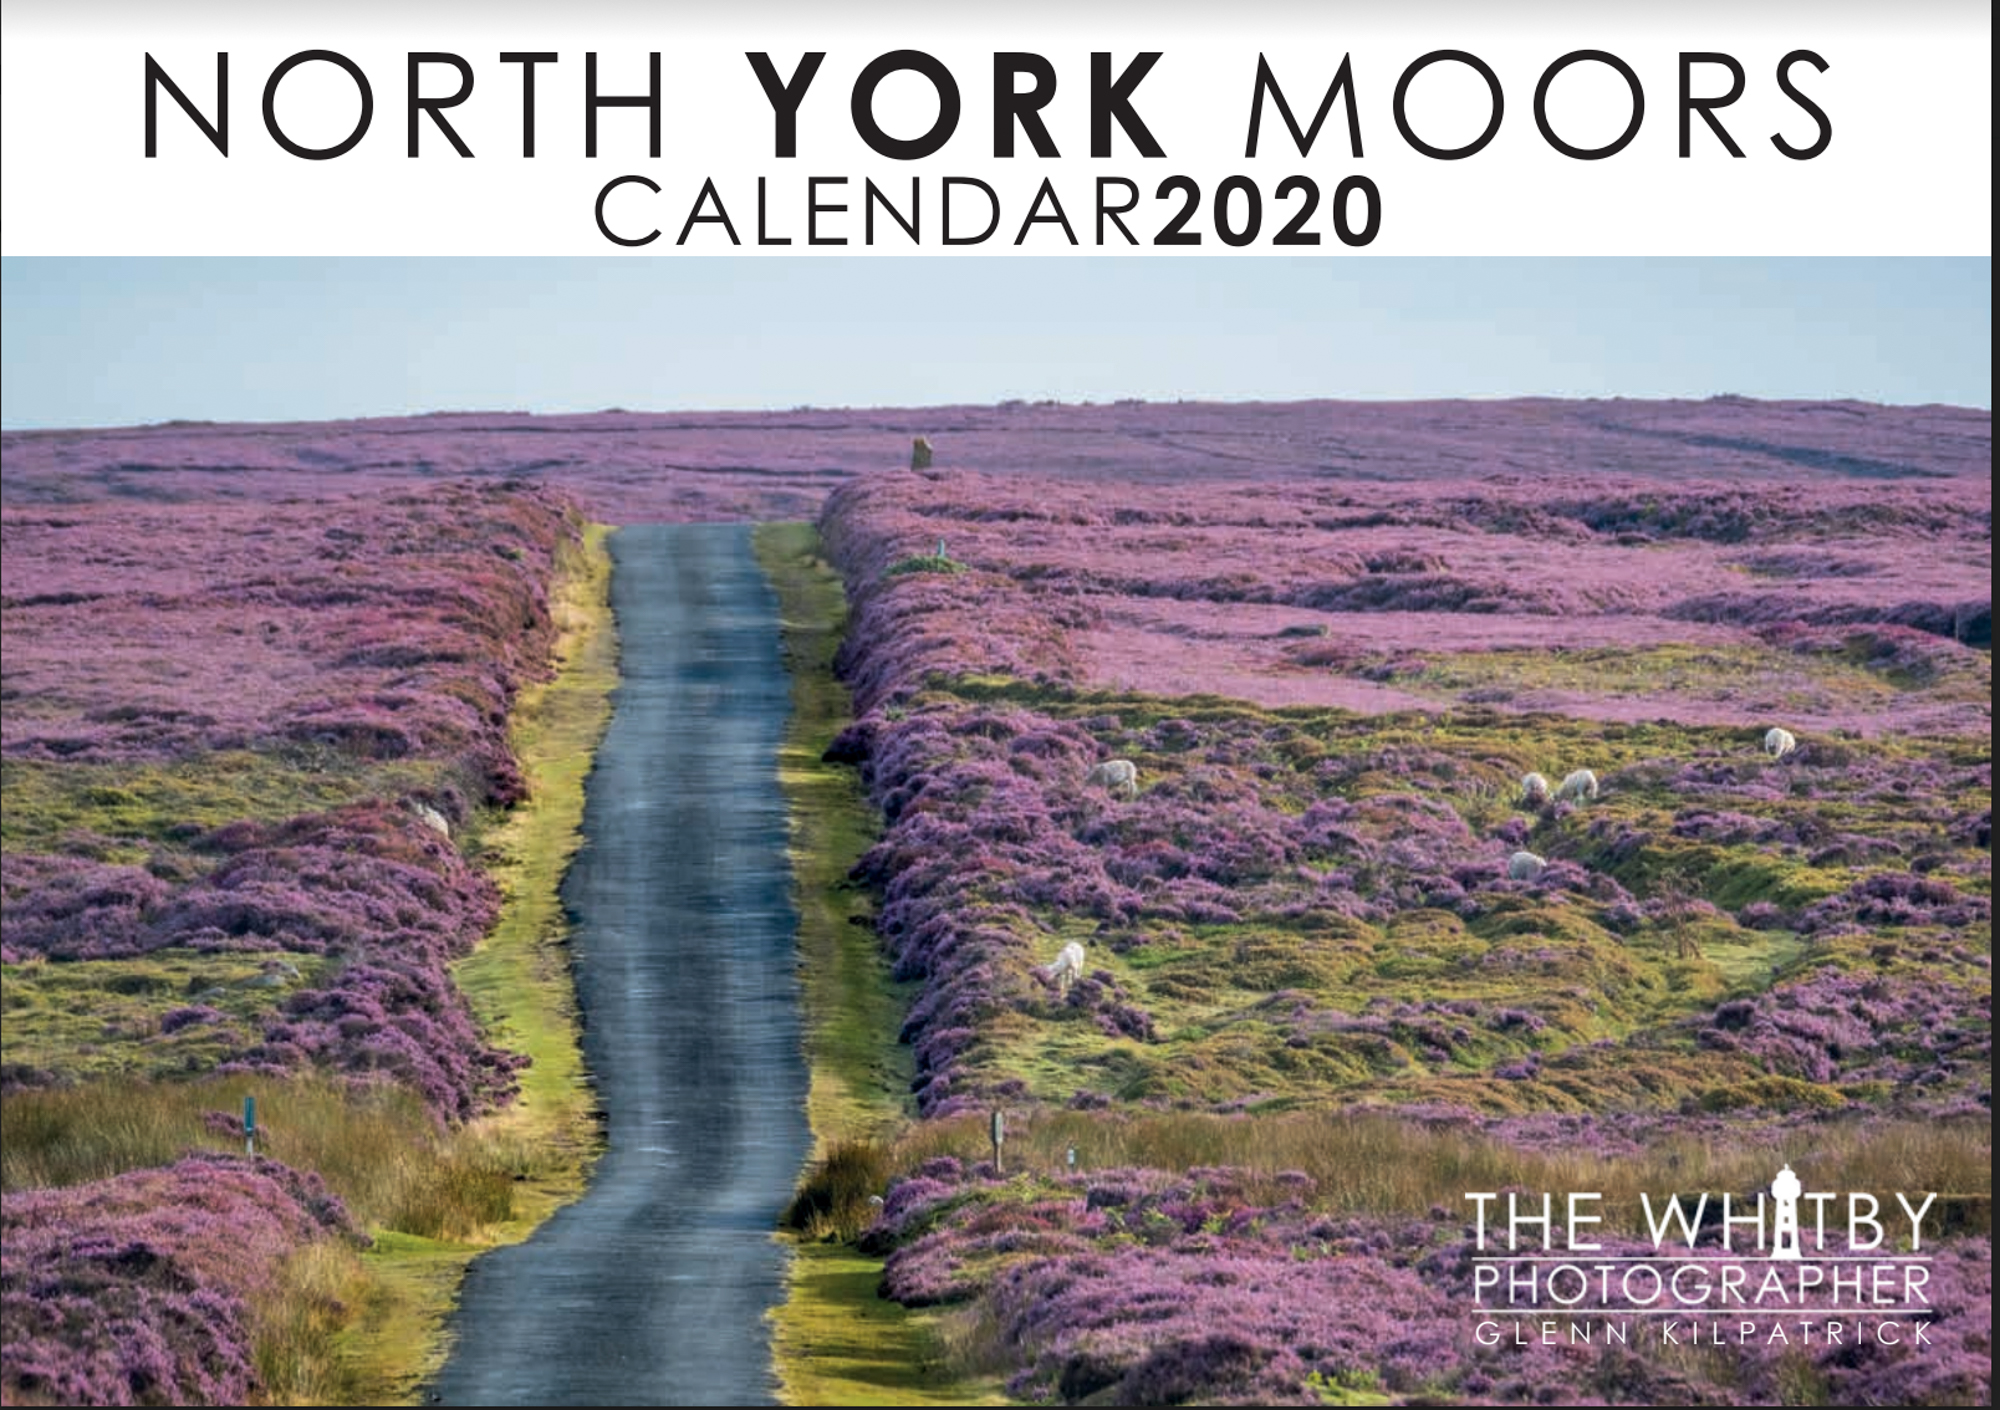 North York Moors Calendar 2020